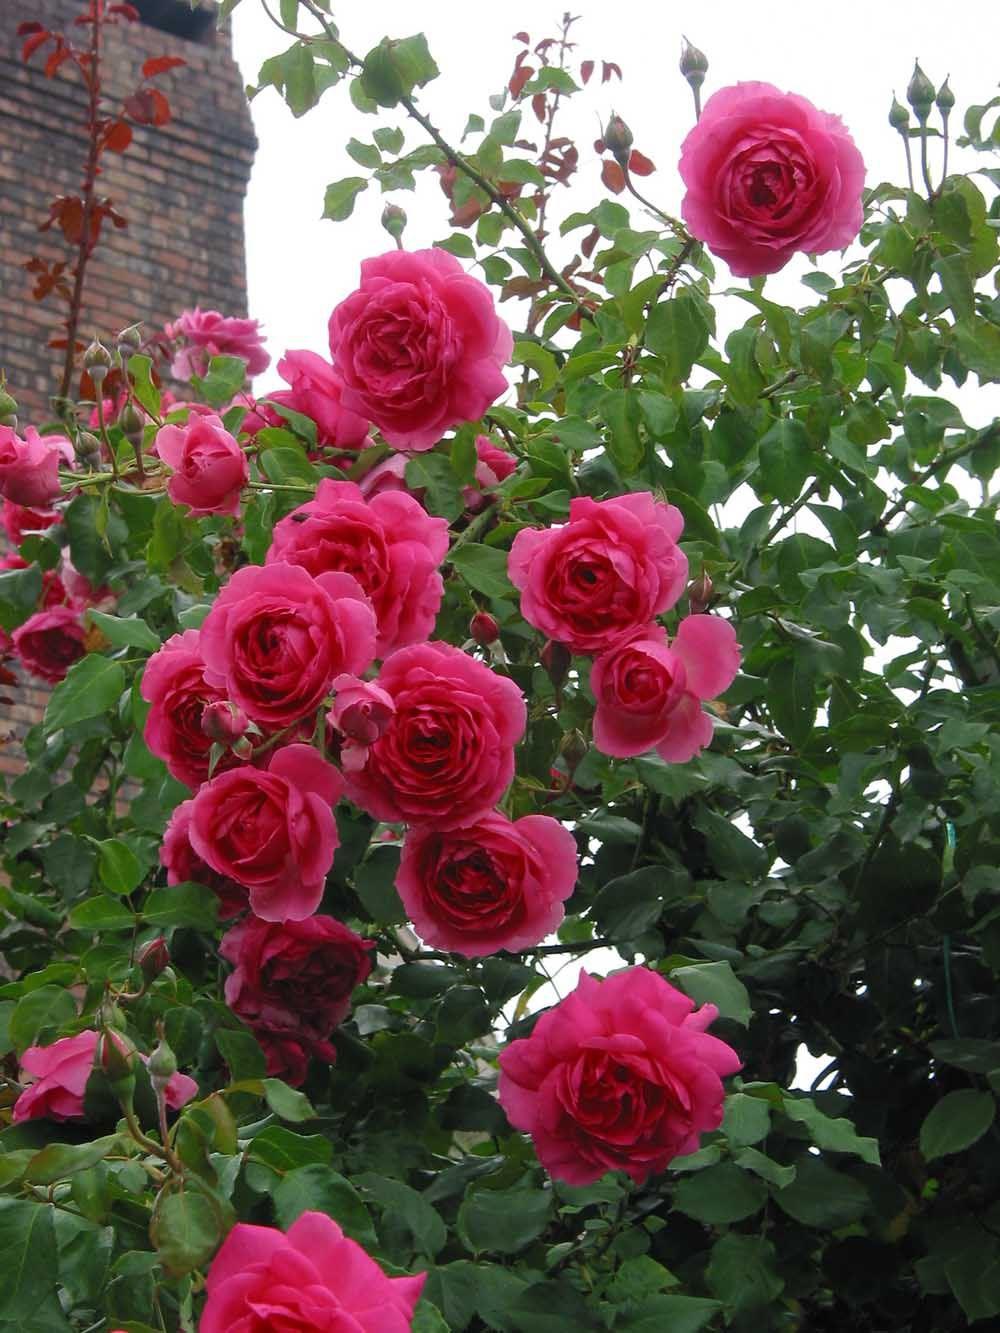 Parade climbing rose questions roses forum gardenweb garden love pinterest gardens - Rose cultivars garden ...